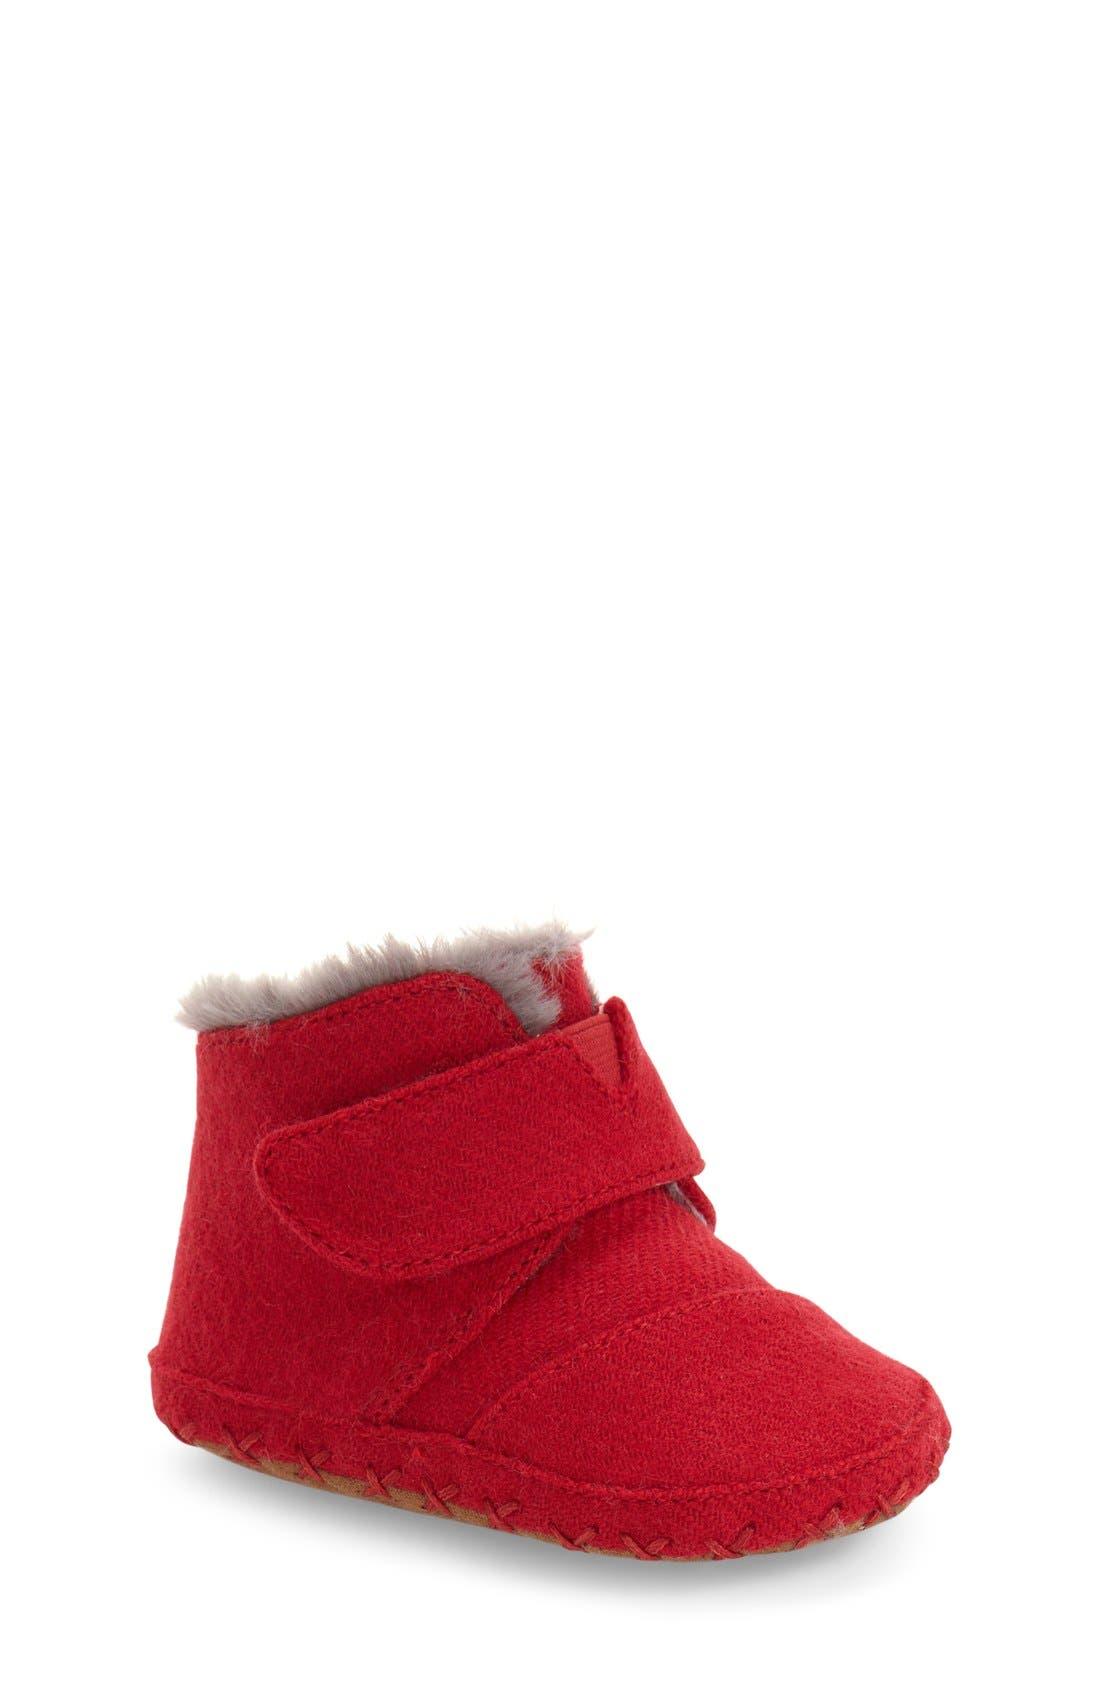 TOMS Cuna Layette Crib Shoe, Main, color, 610